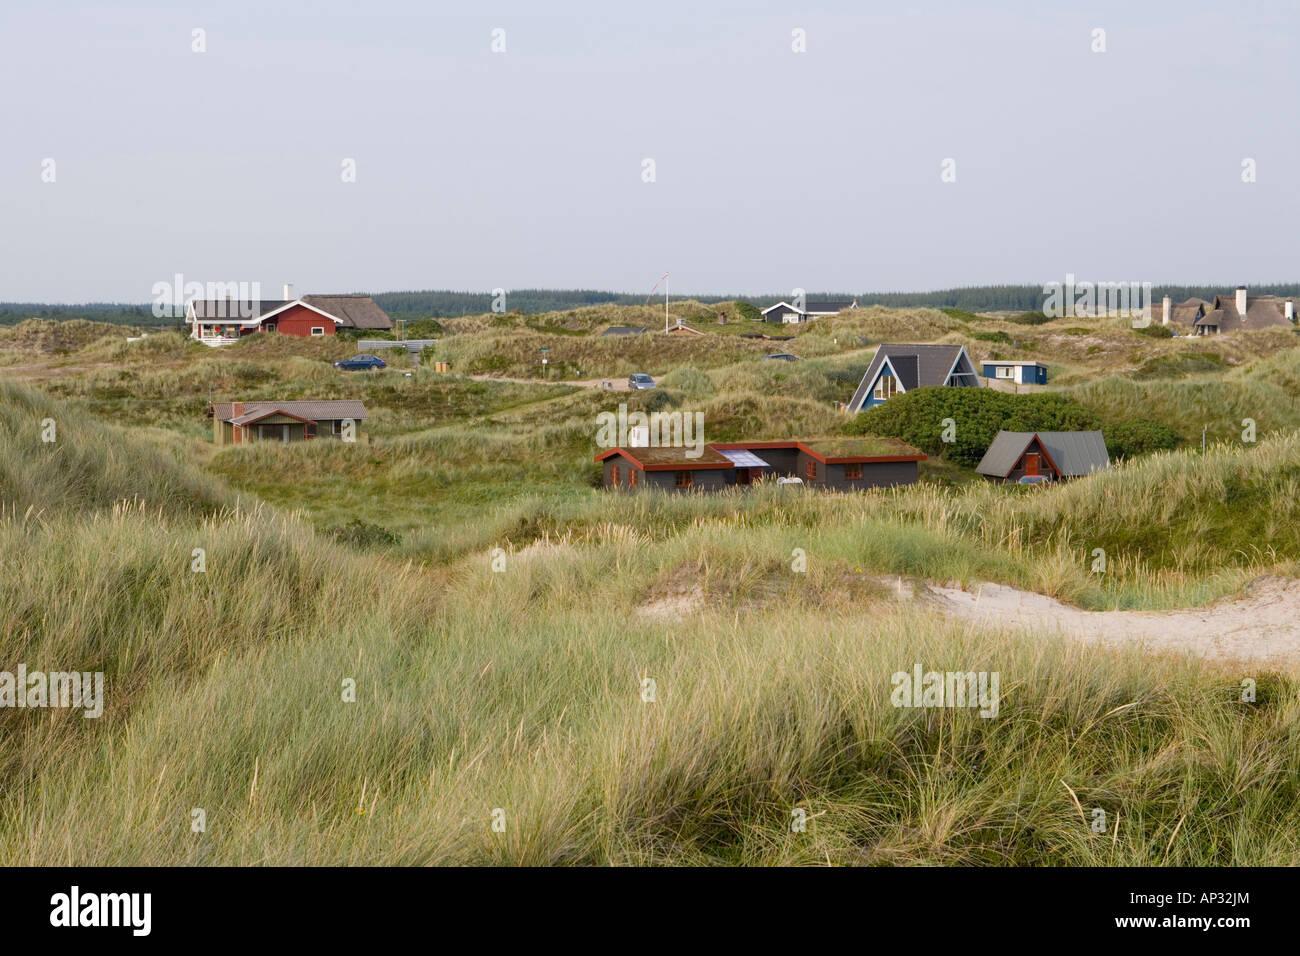 Vacation Home in Dunes, Ferienhaus in Duenen, Henne Strand, Central Jutland, Denmark - Stock Image